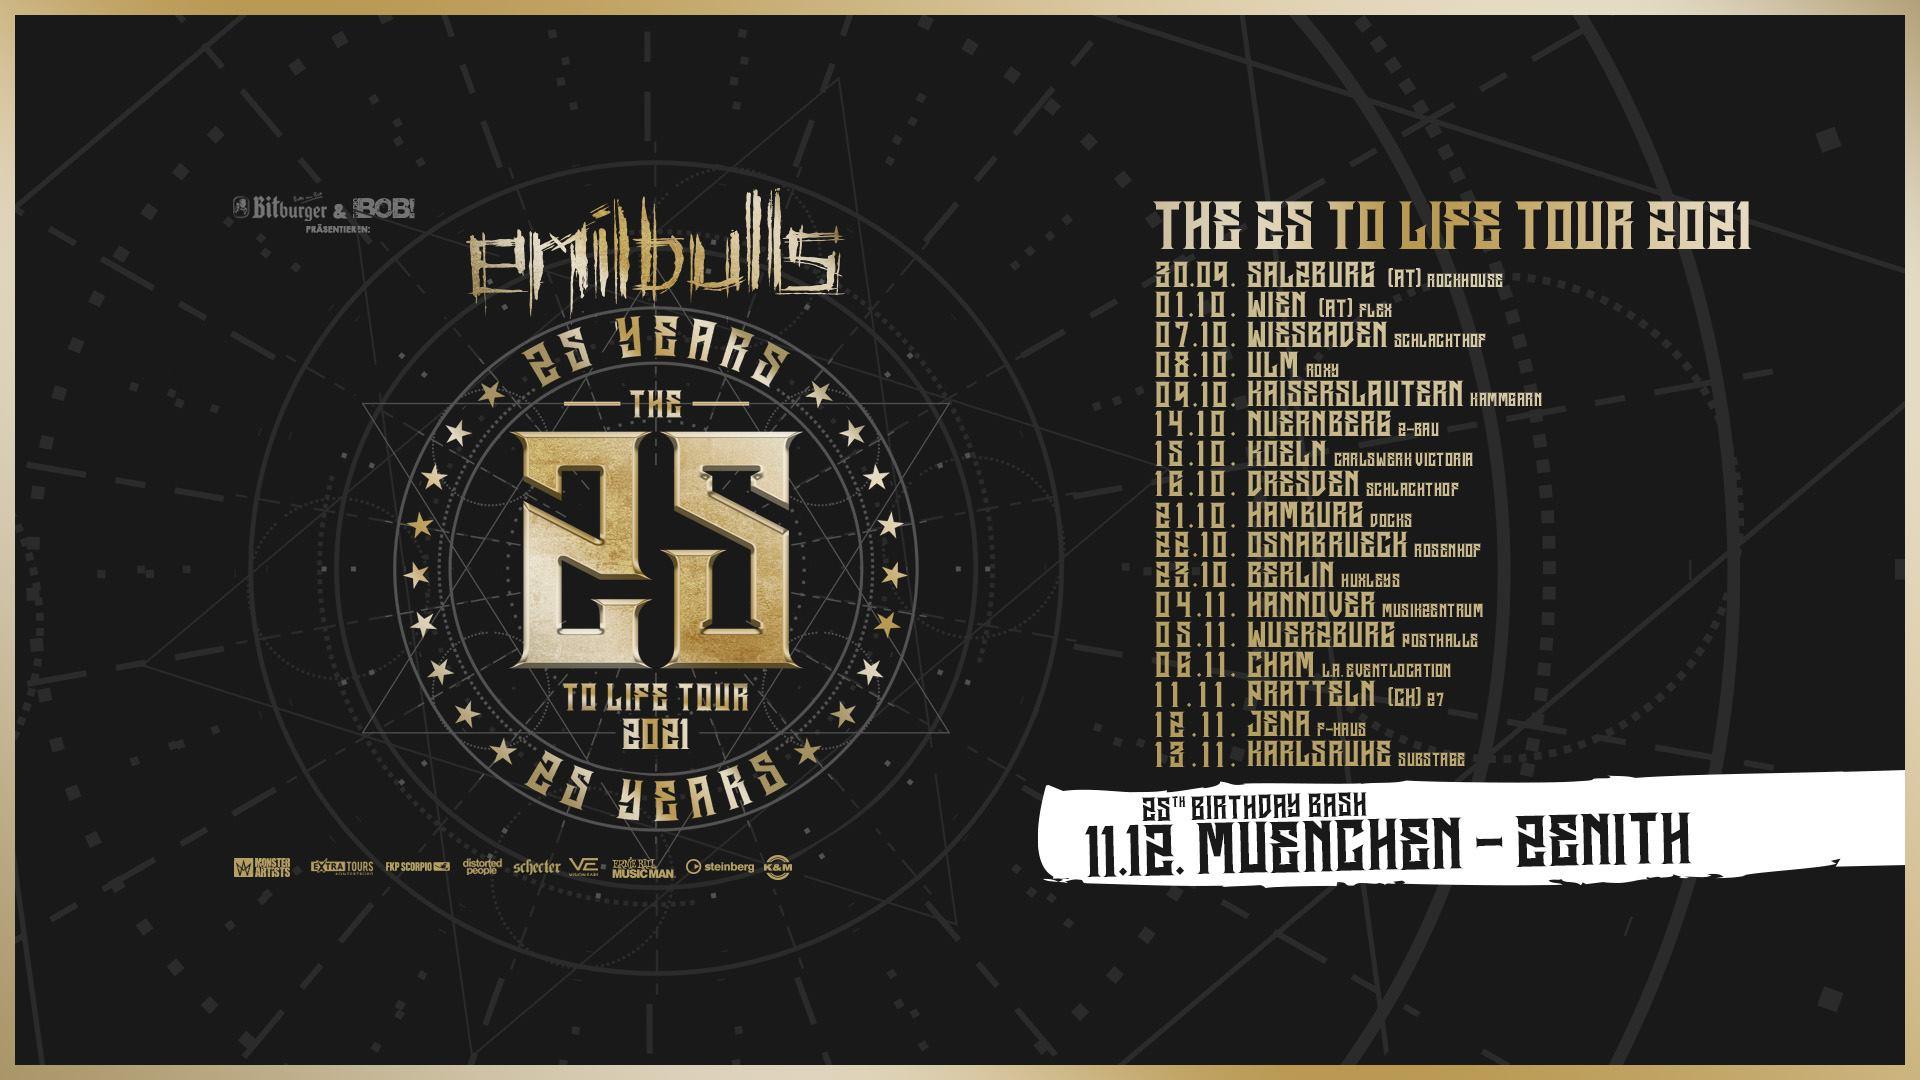 Emil Bulls am 30. September 2021 @ Rockhouse Salzburg.